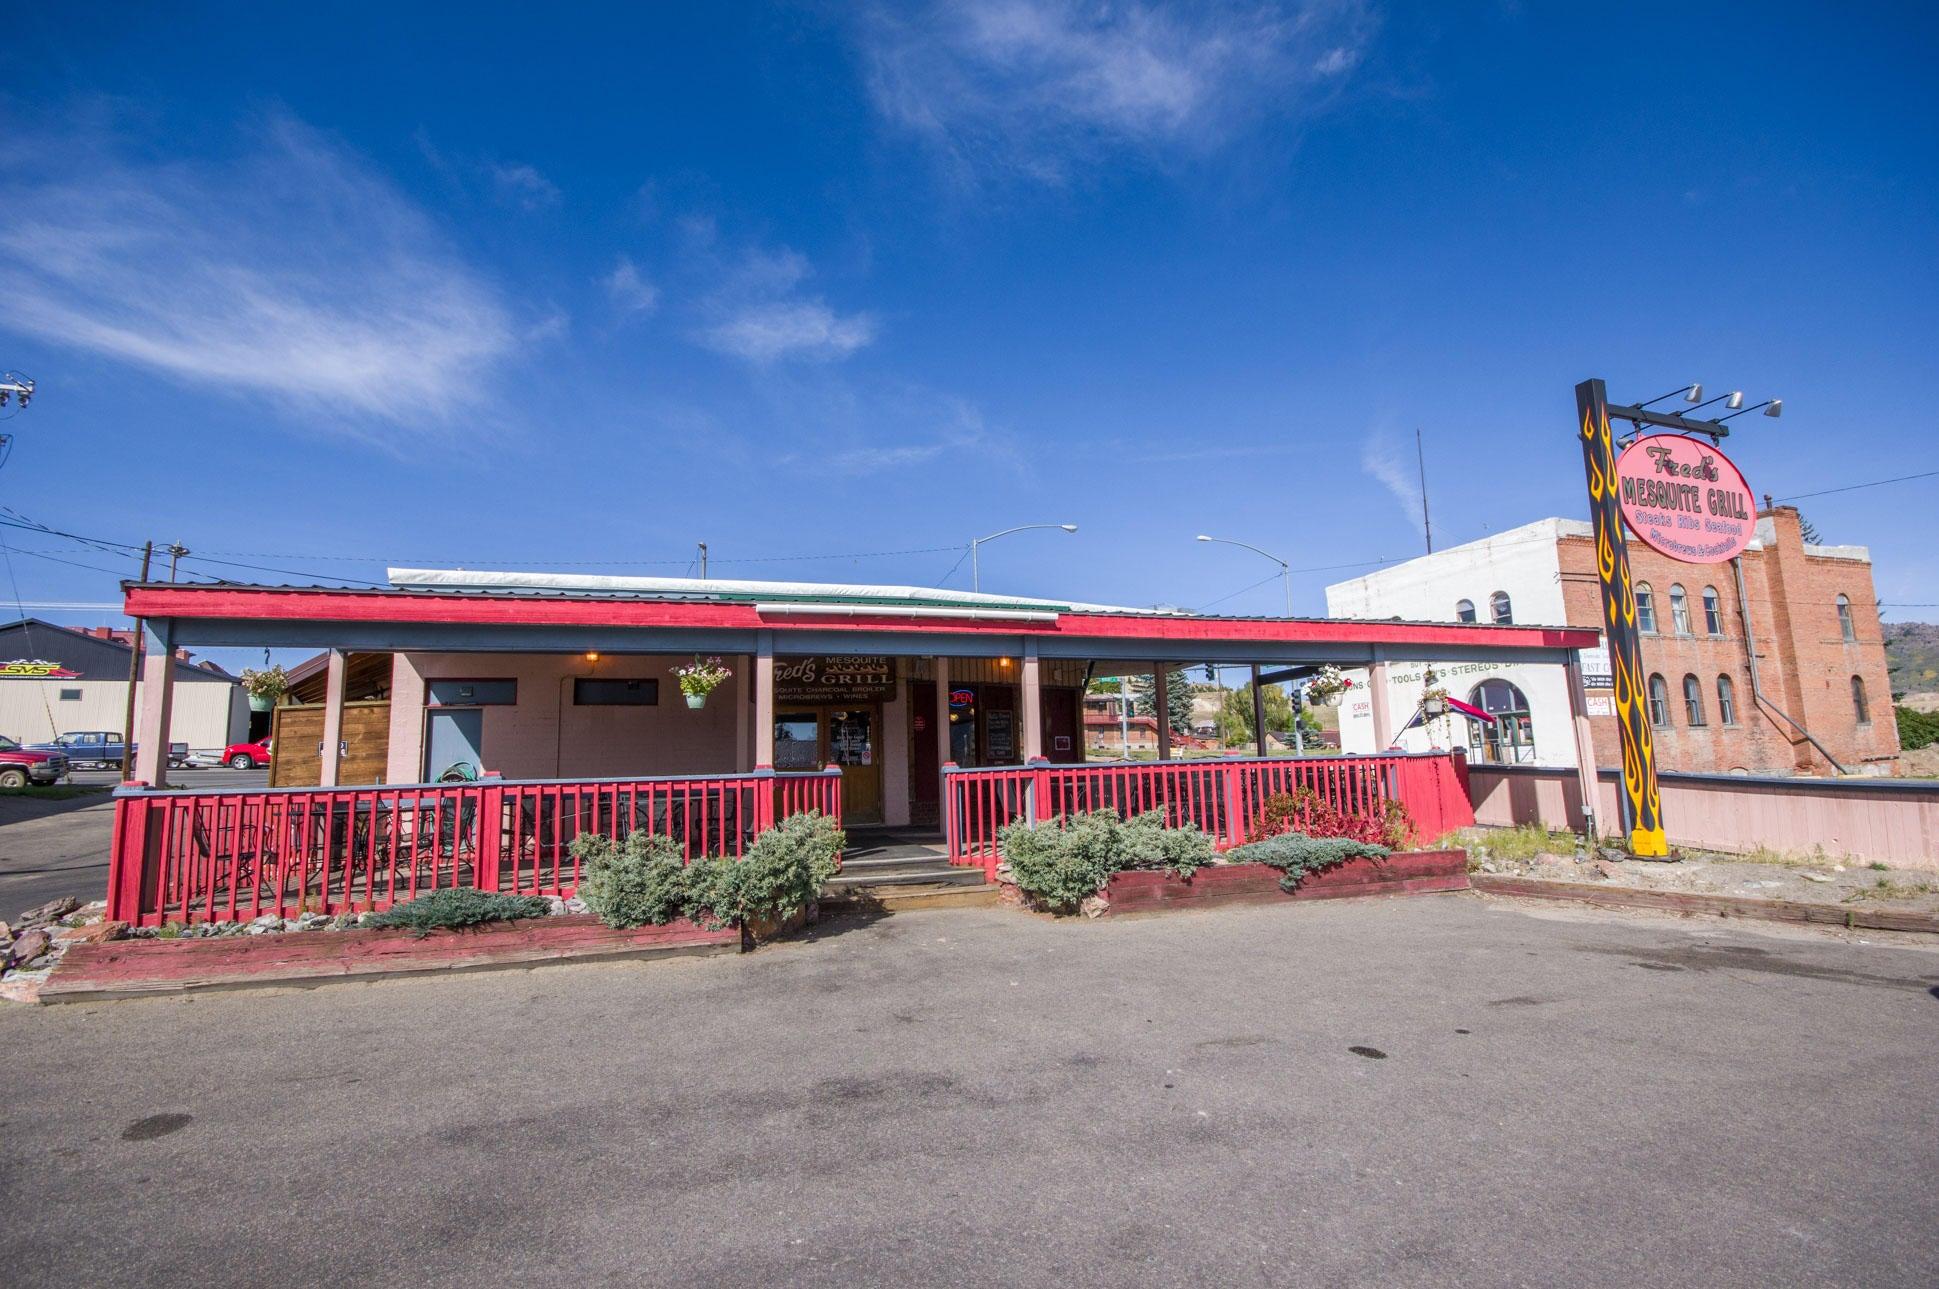 206 S Arizona Street, Butte, MT 59701